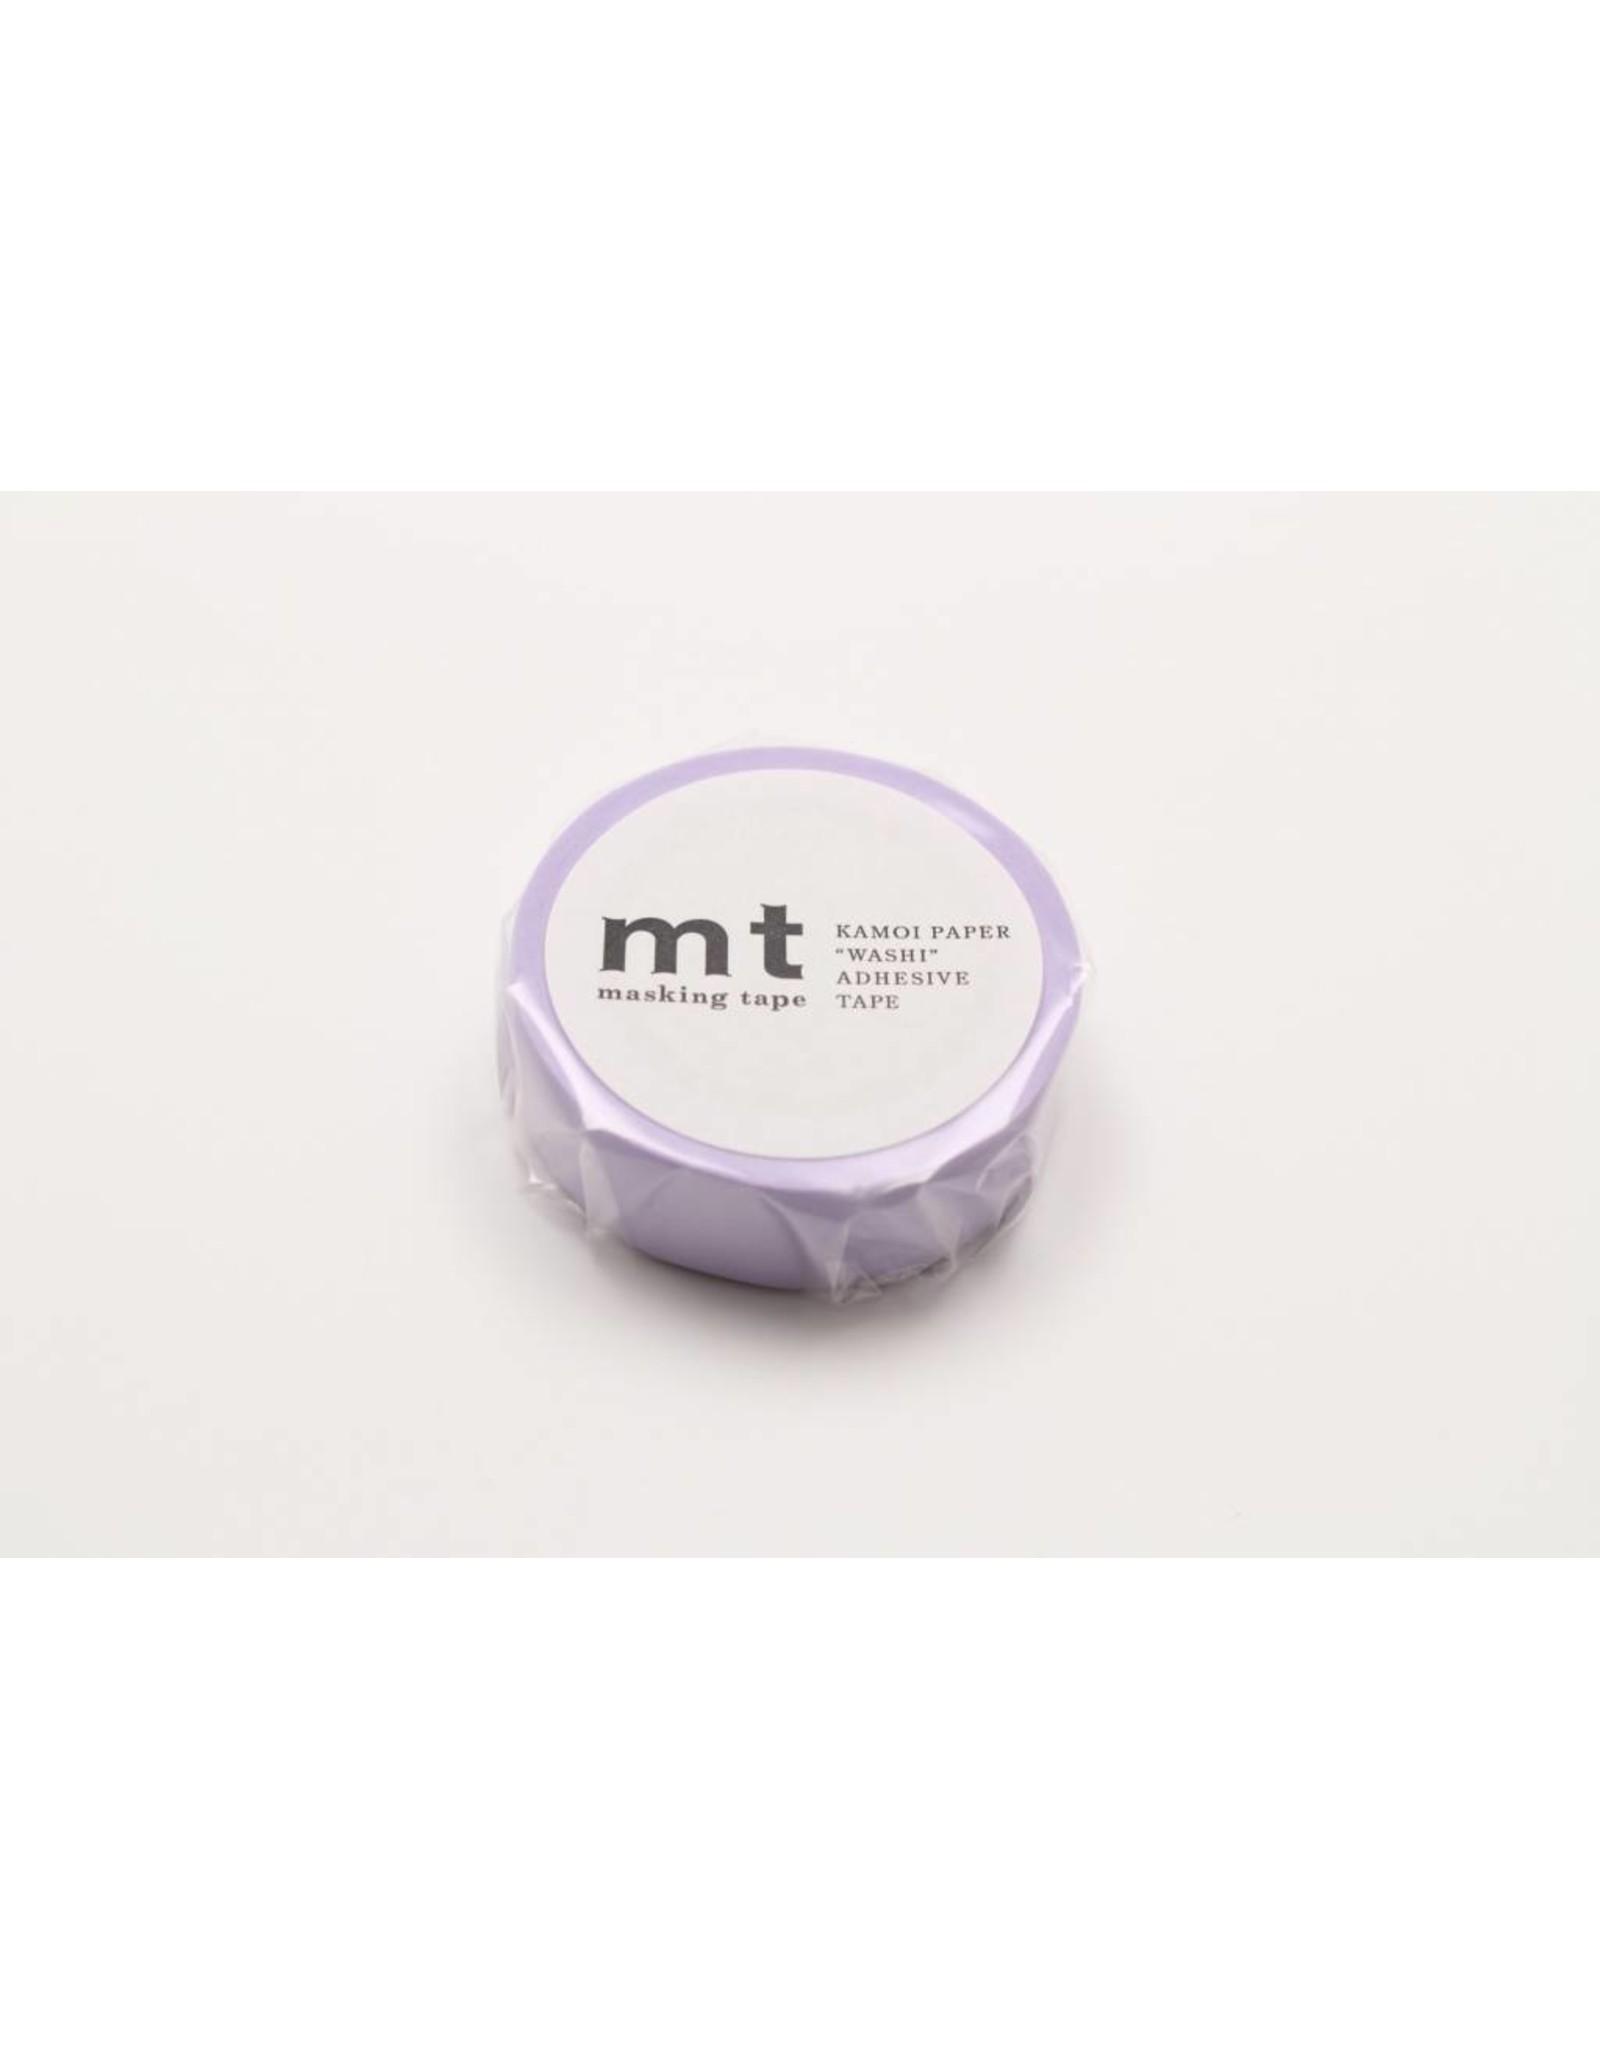 Mt pastel purple